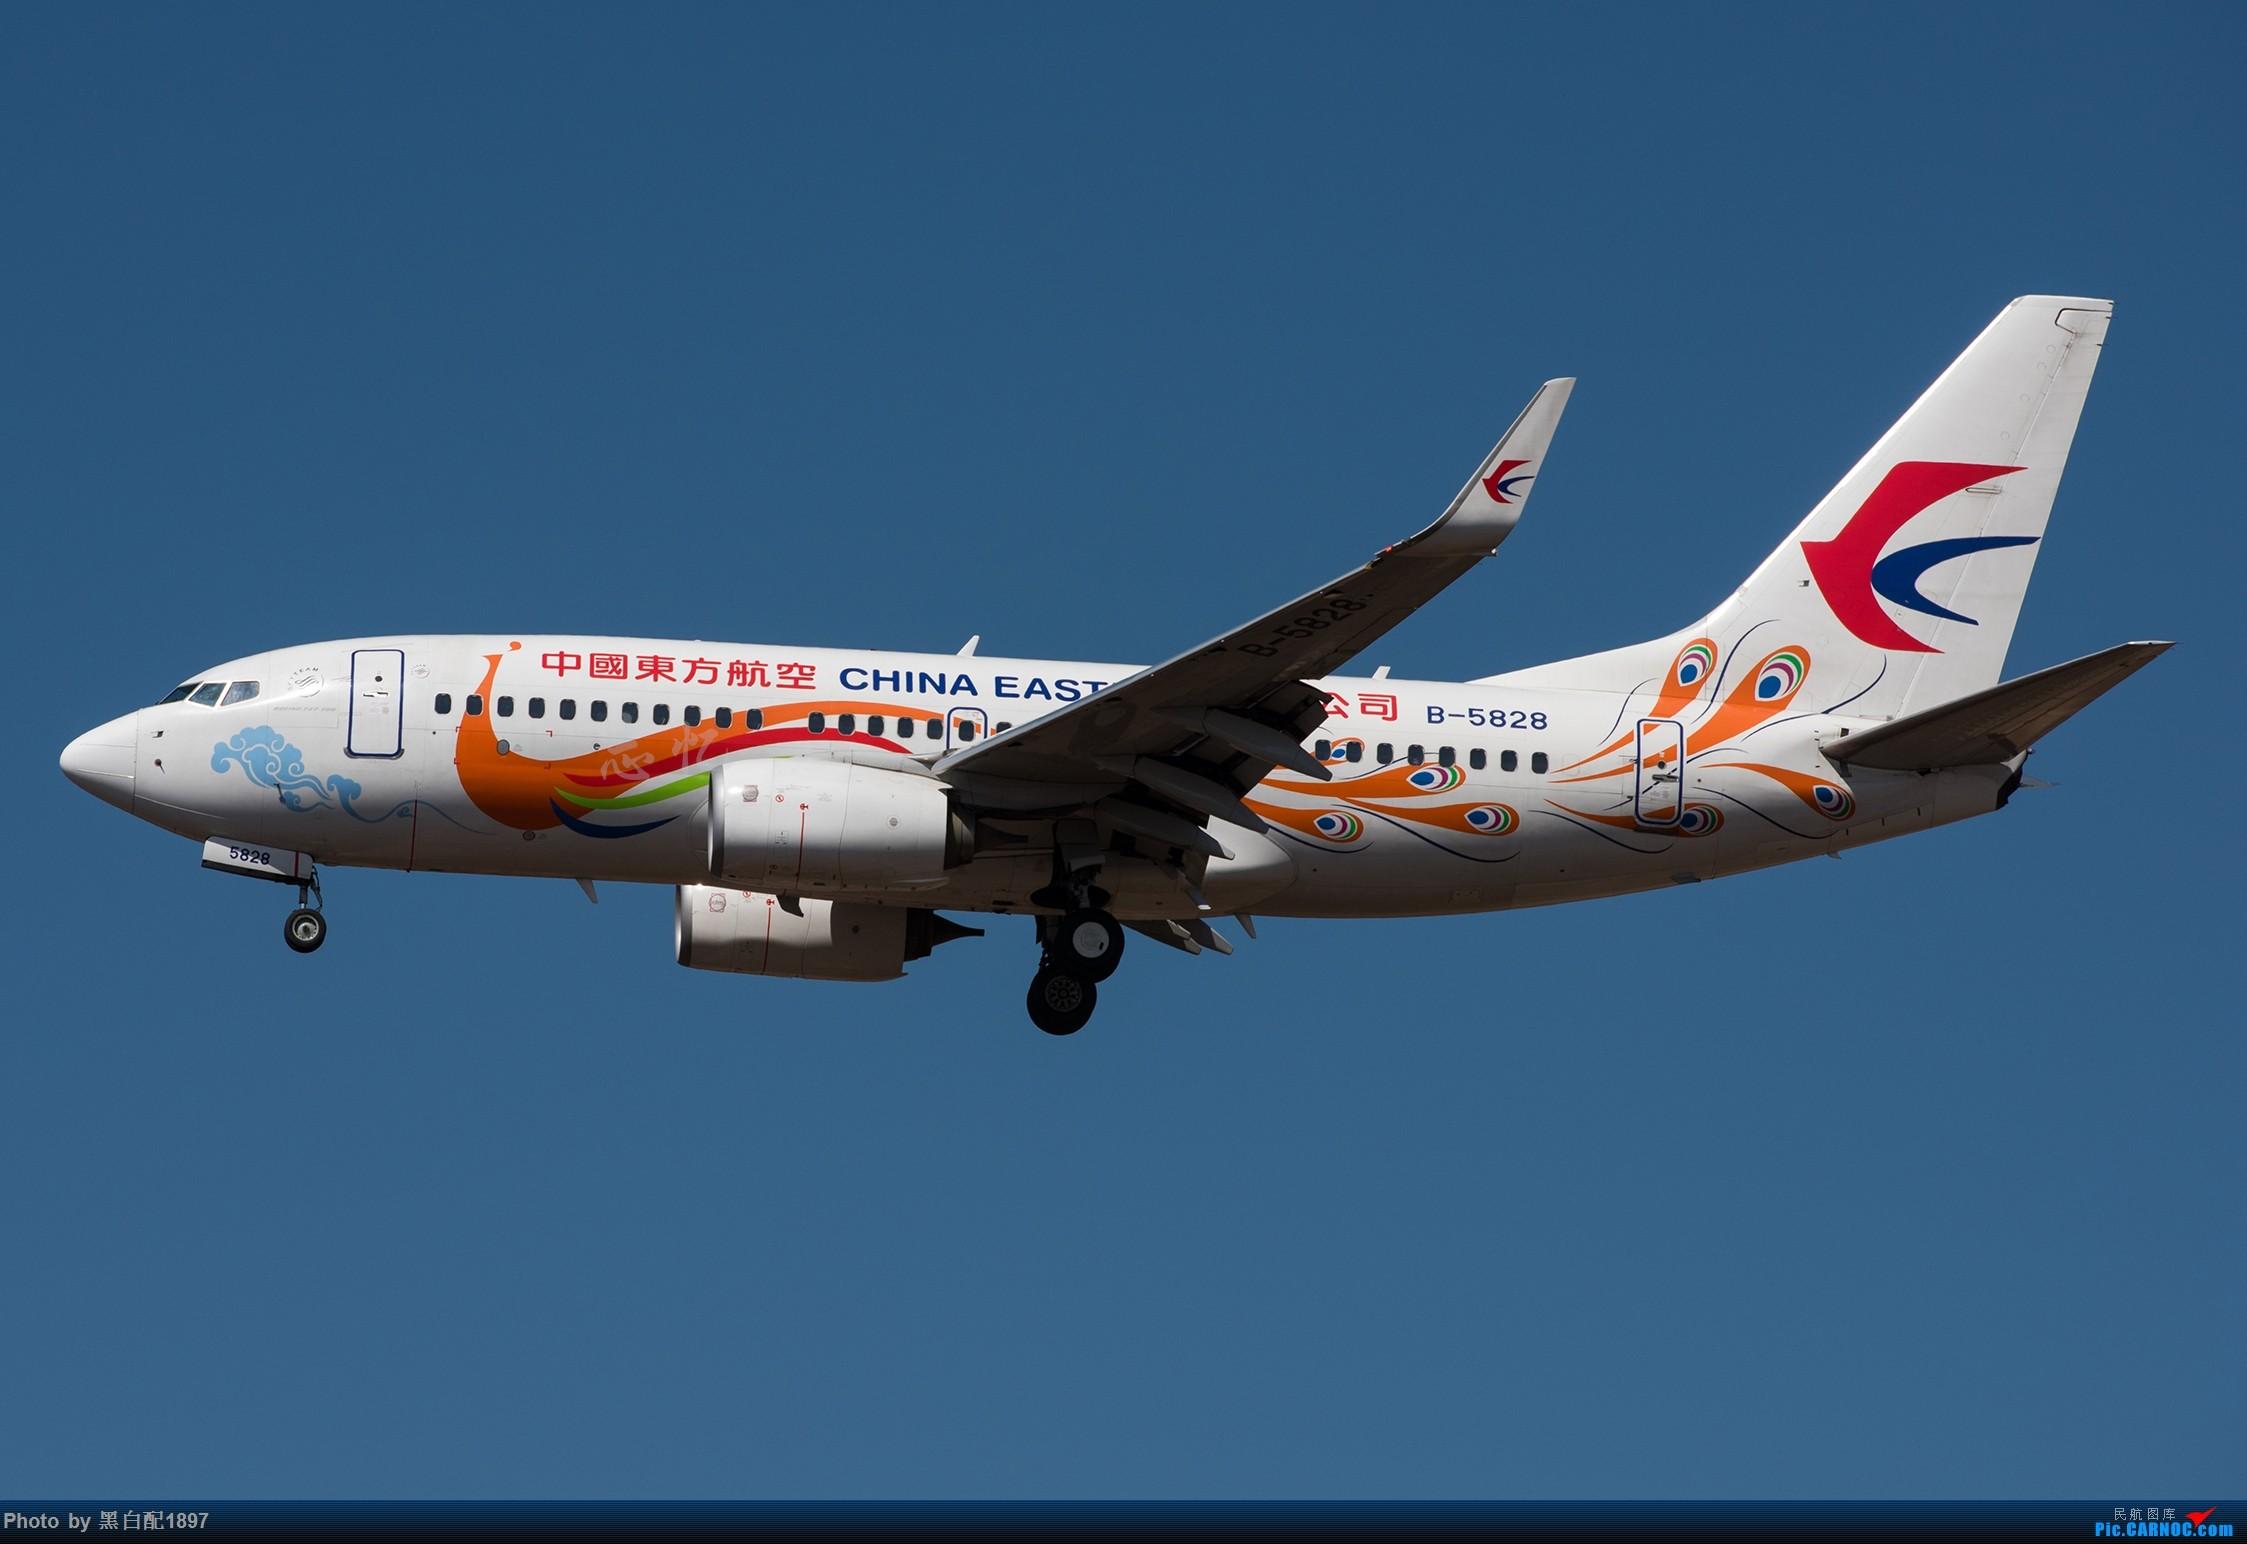 Re:鸡年收官图第二版 BOEING 737-700 B-5828 中国昆明长水国际机场